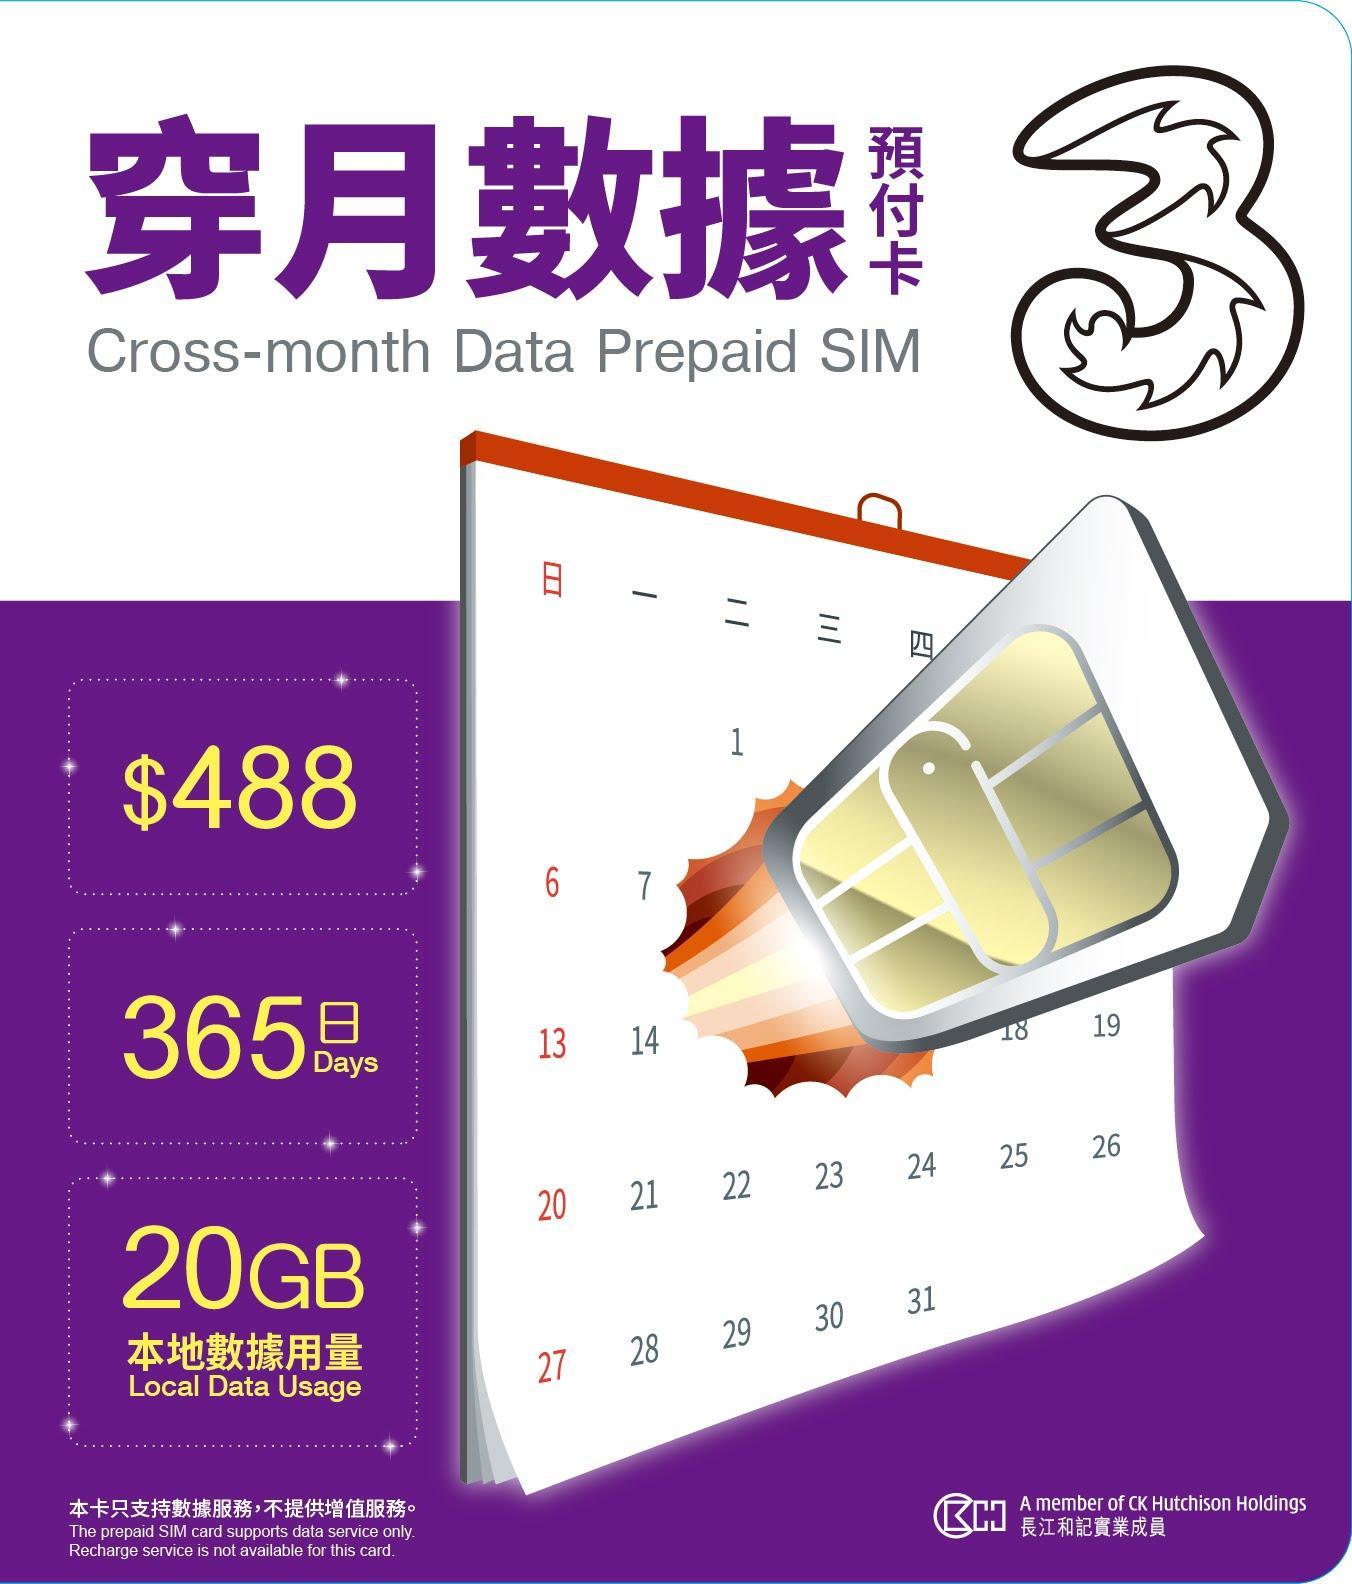 Threecommo 3g Macau Voucher 3 1gb Cross Month Data Prepaid Sim 365 Days